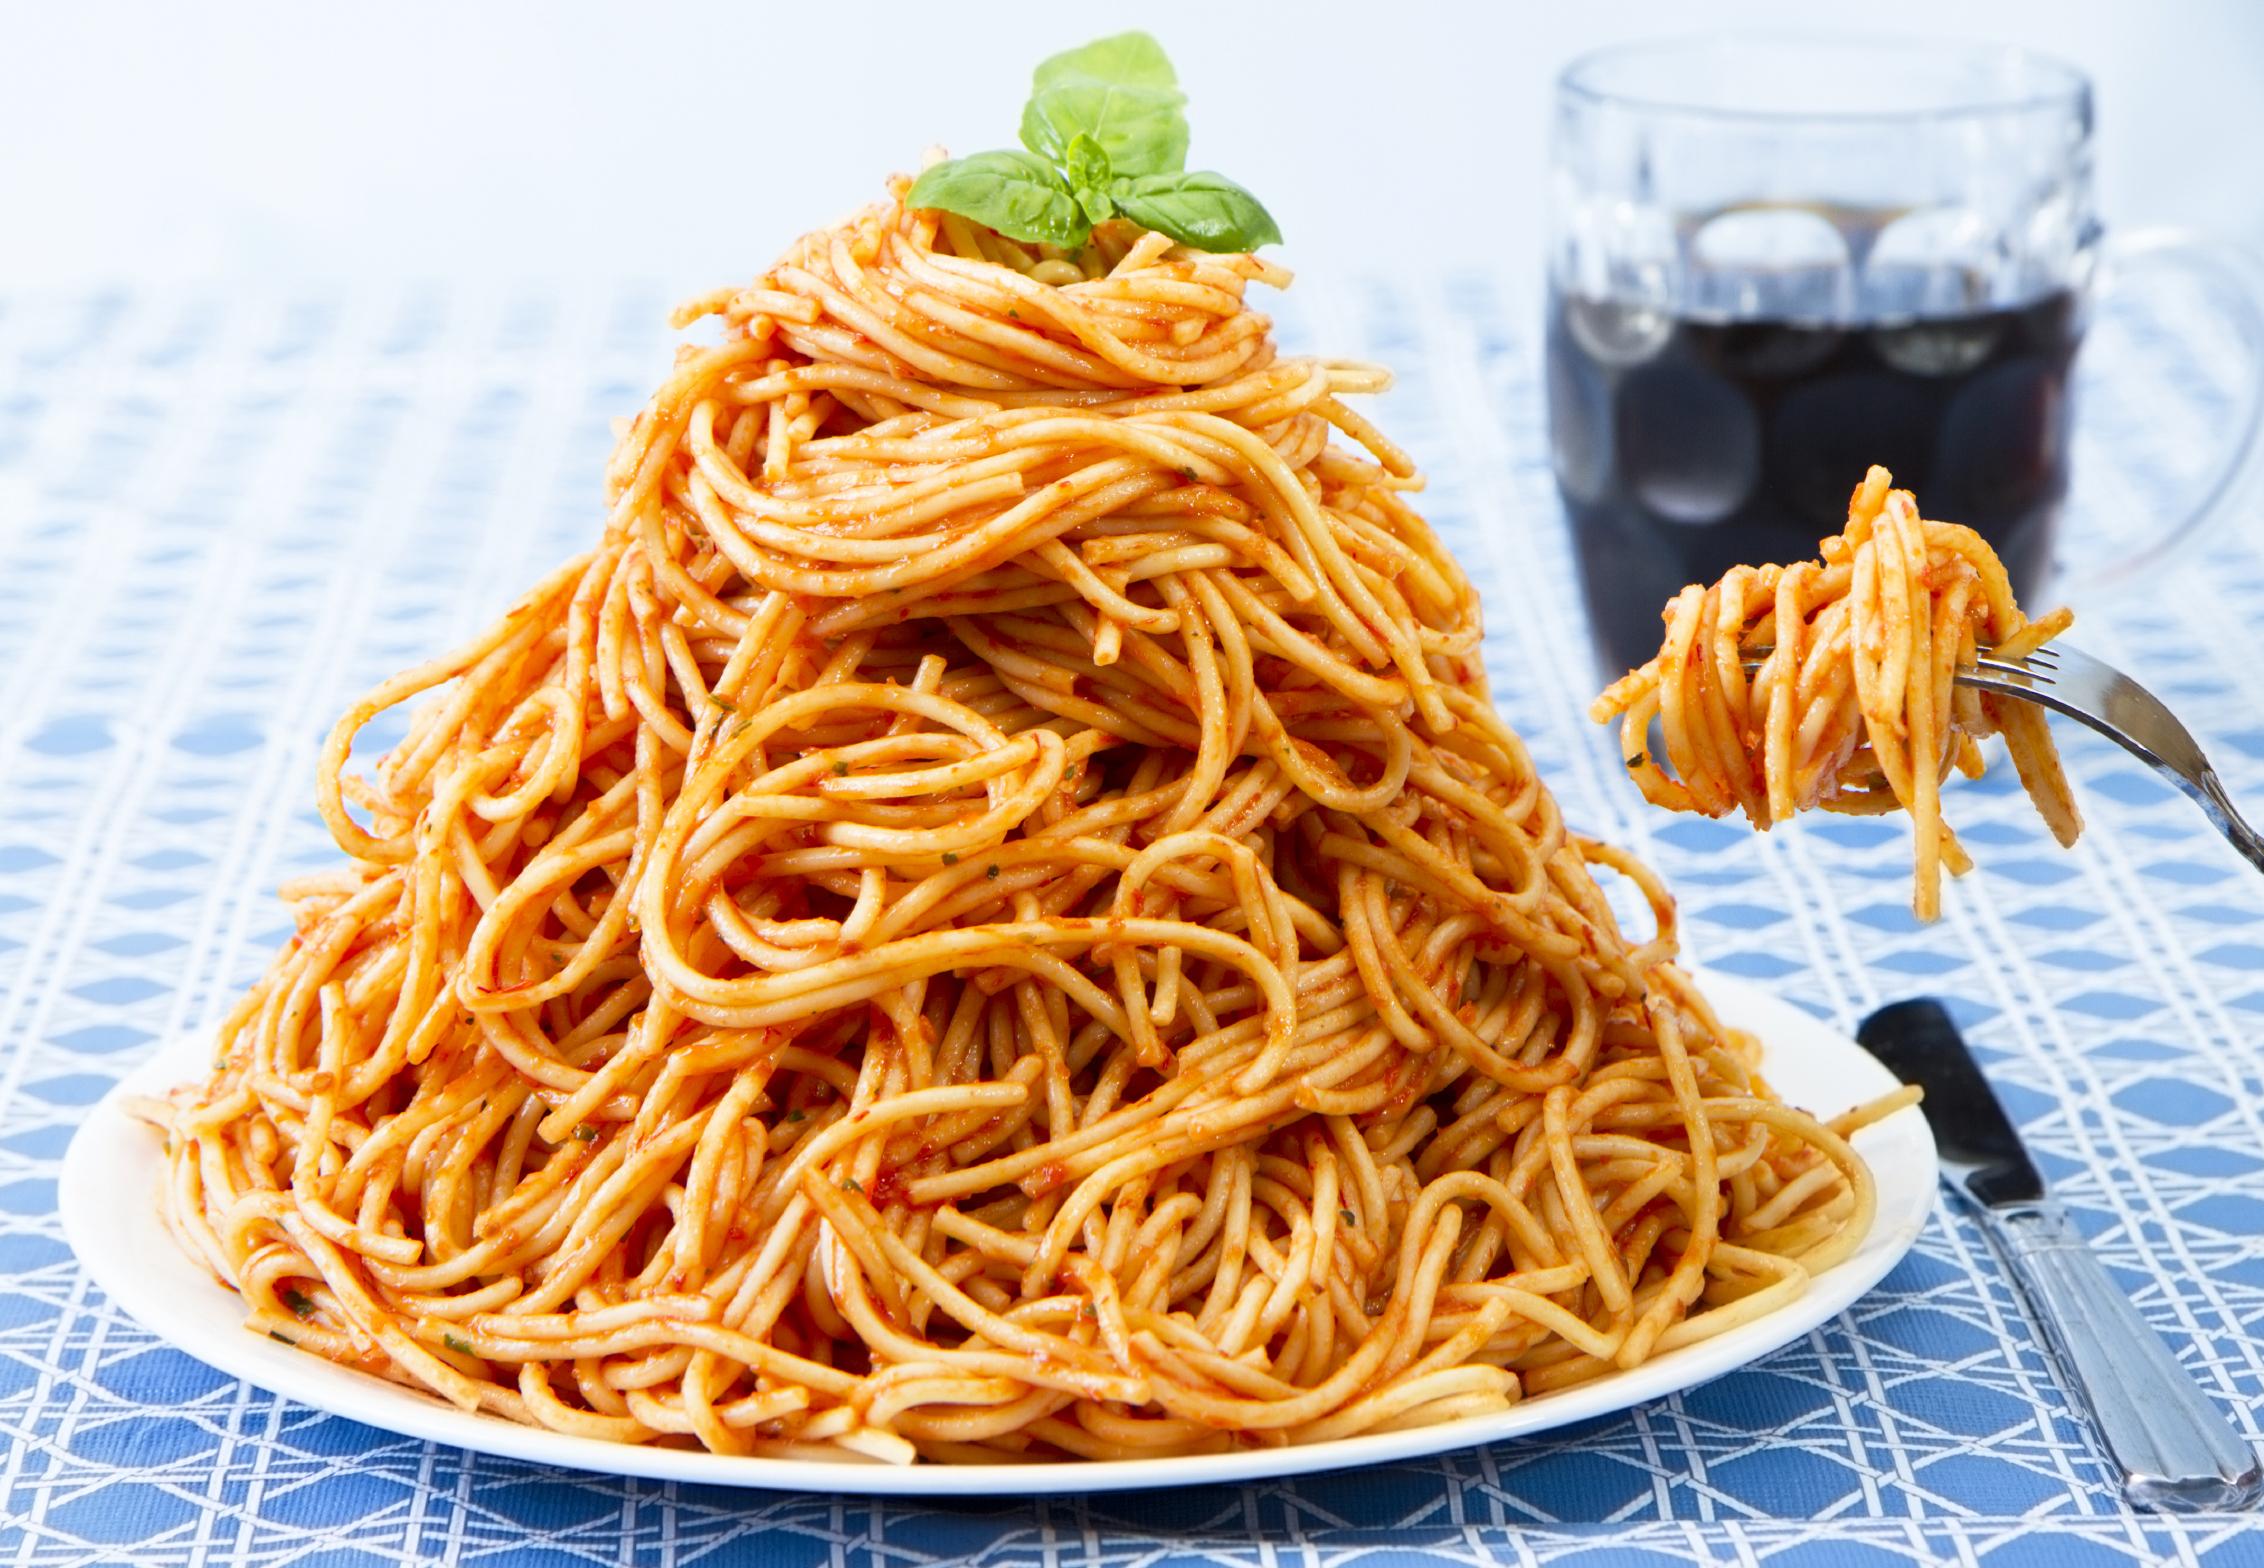 overeat-spagetti-iStock_000016901791_Large.jpg